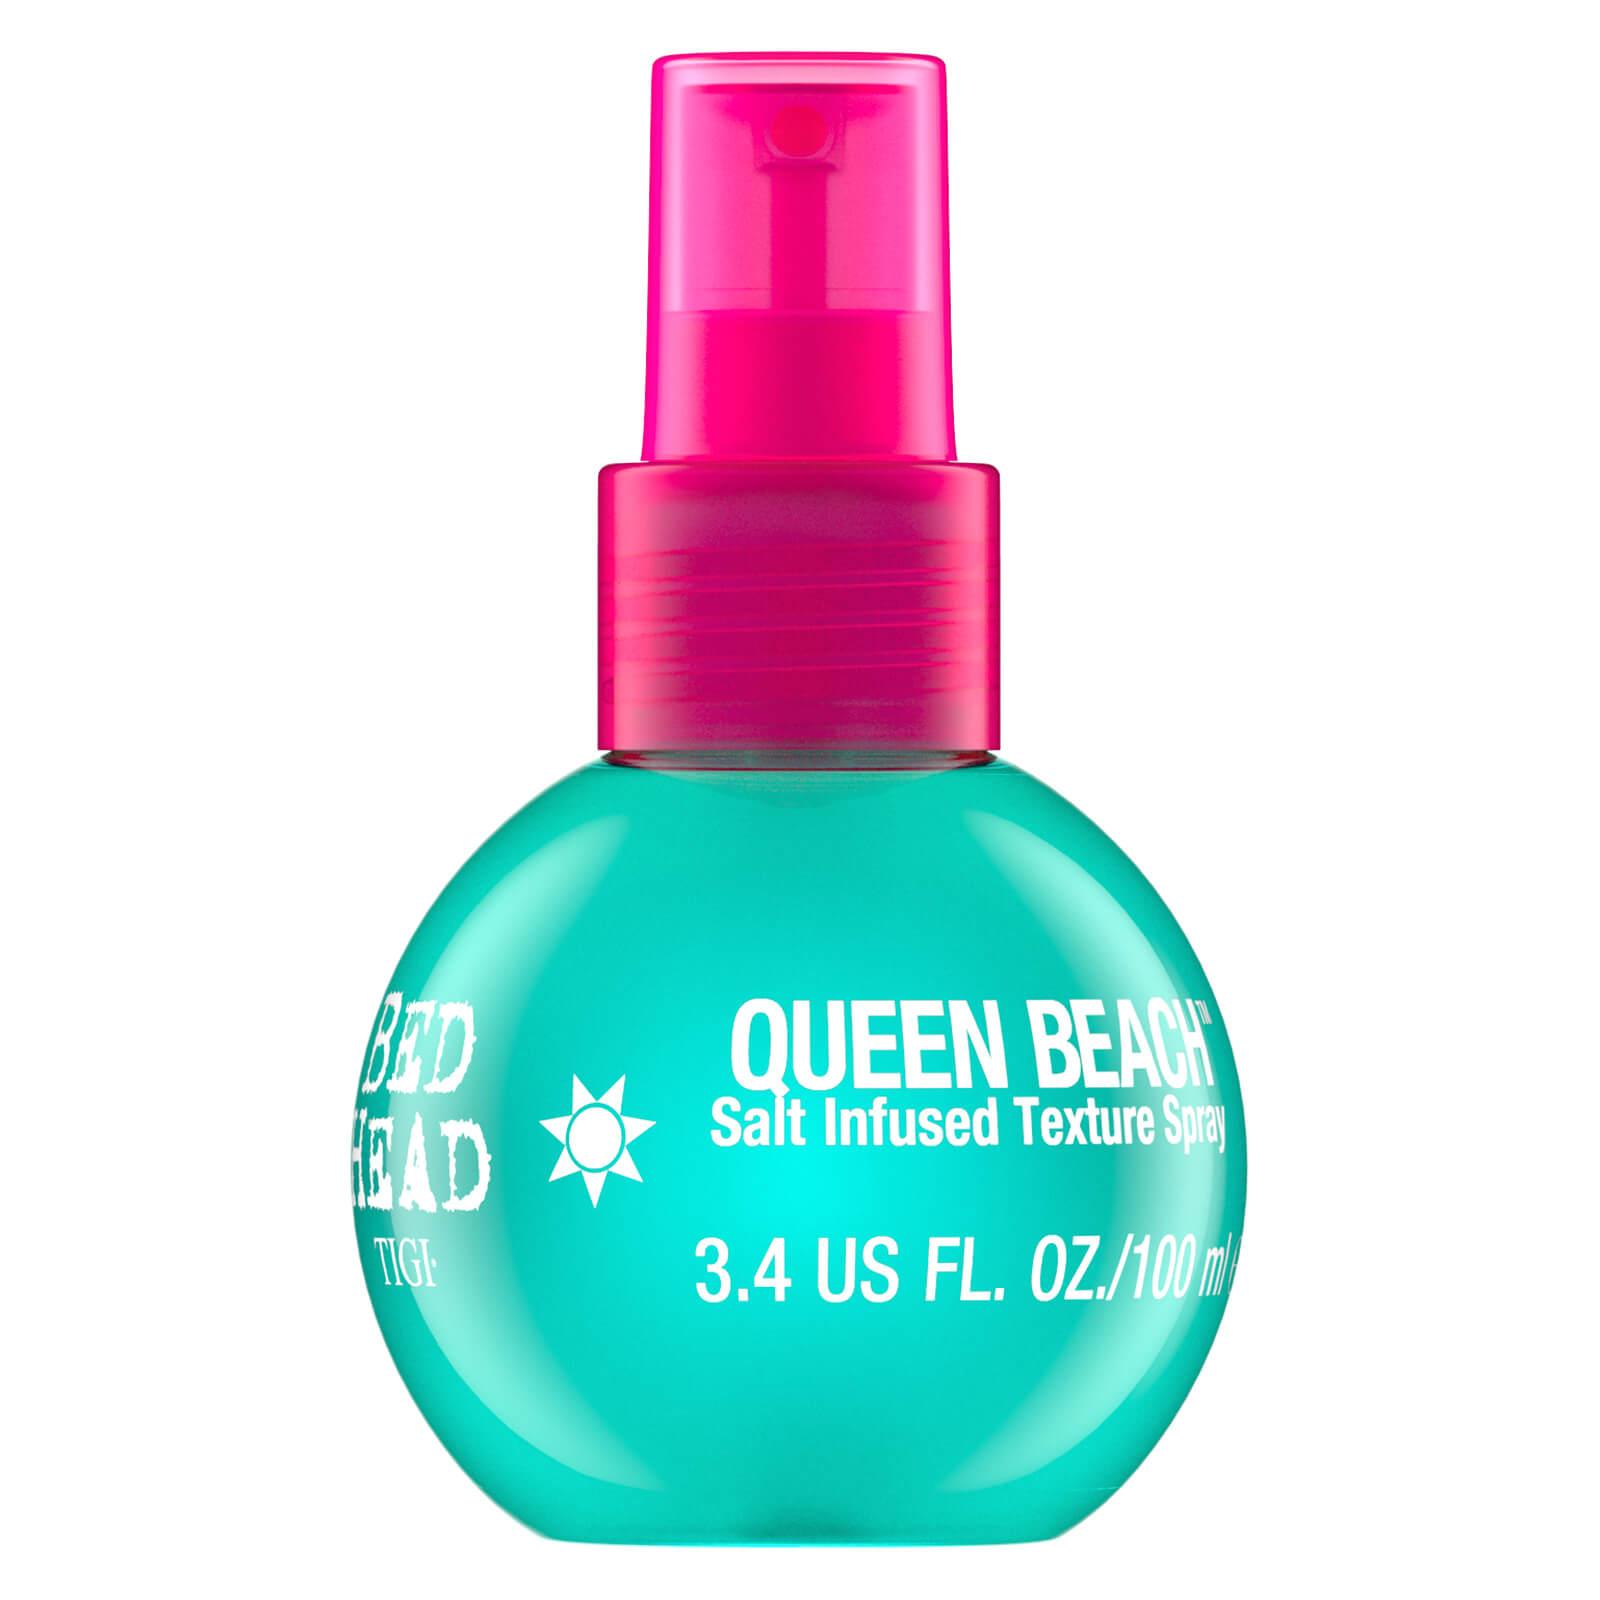 TIGI Spray texturisant au sel de marin Queen Beach TIGI Bed Head